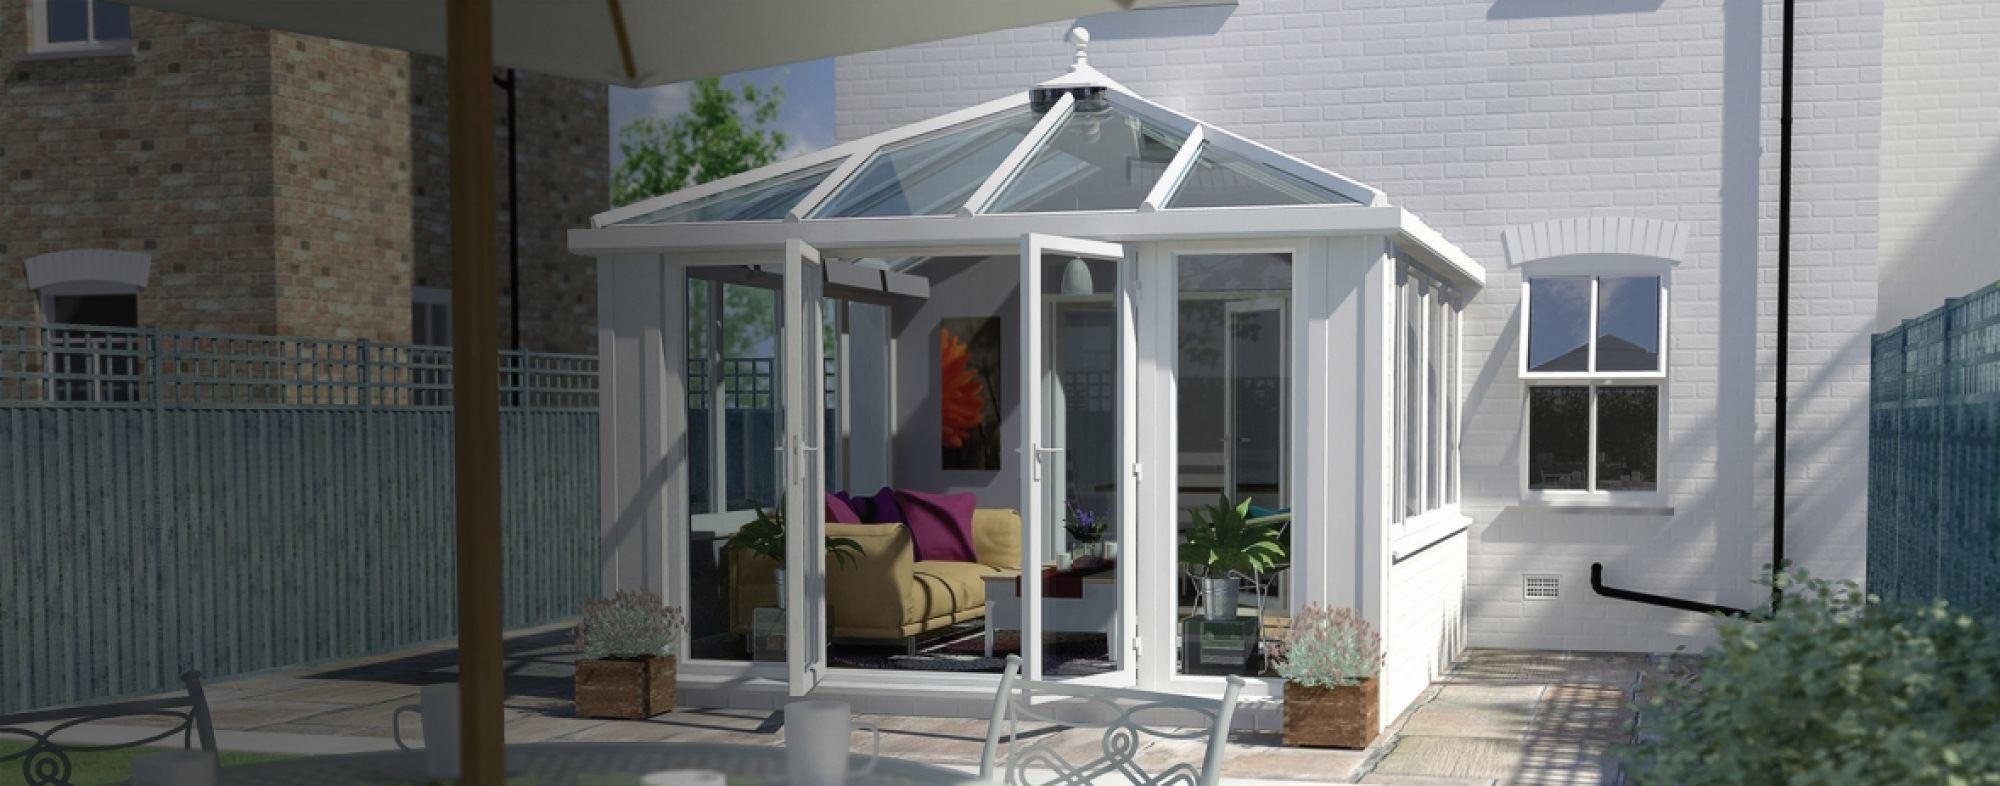 conservatory village conservatories southampton hampshire. Black Bedroom Furniture Sets. Home Design Ideas